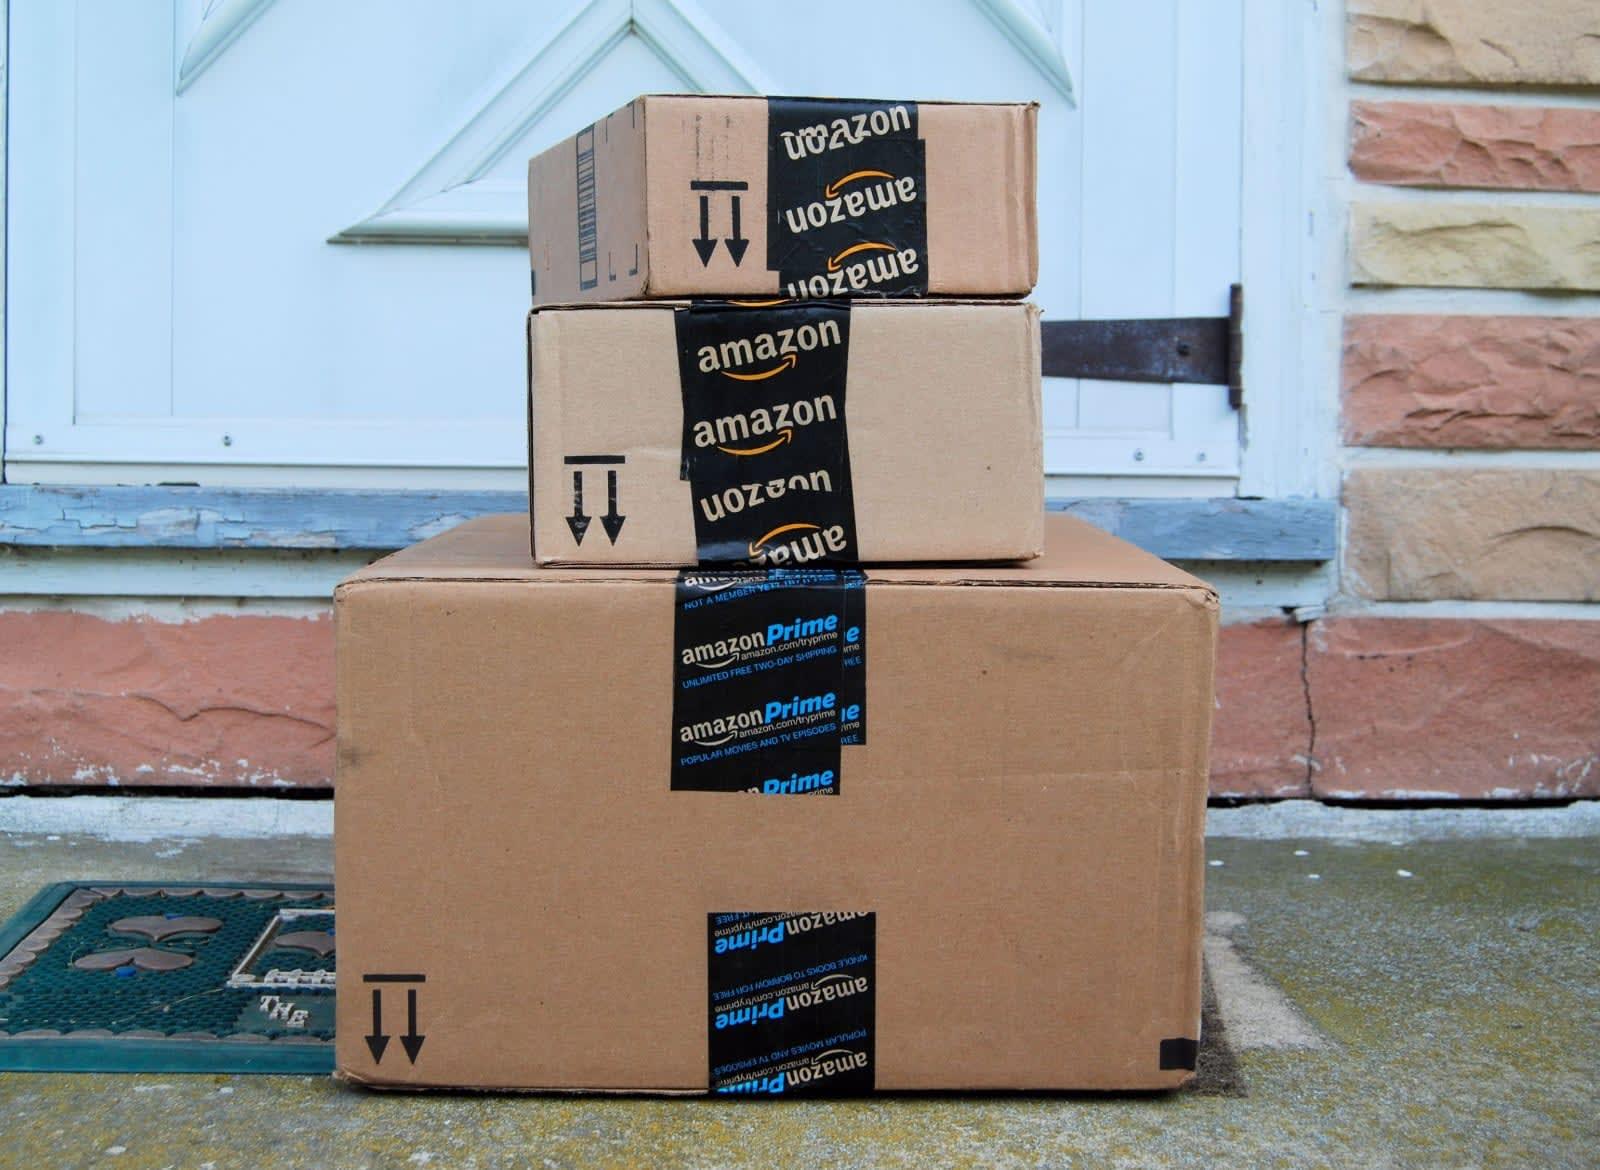 Amazon Prime is now available in Australia